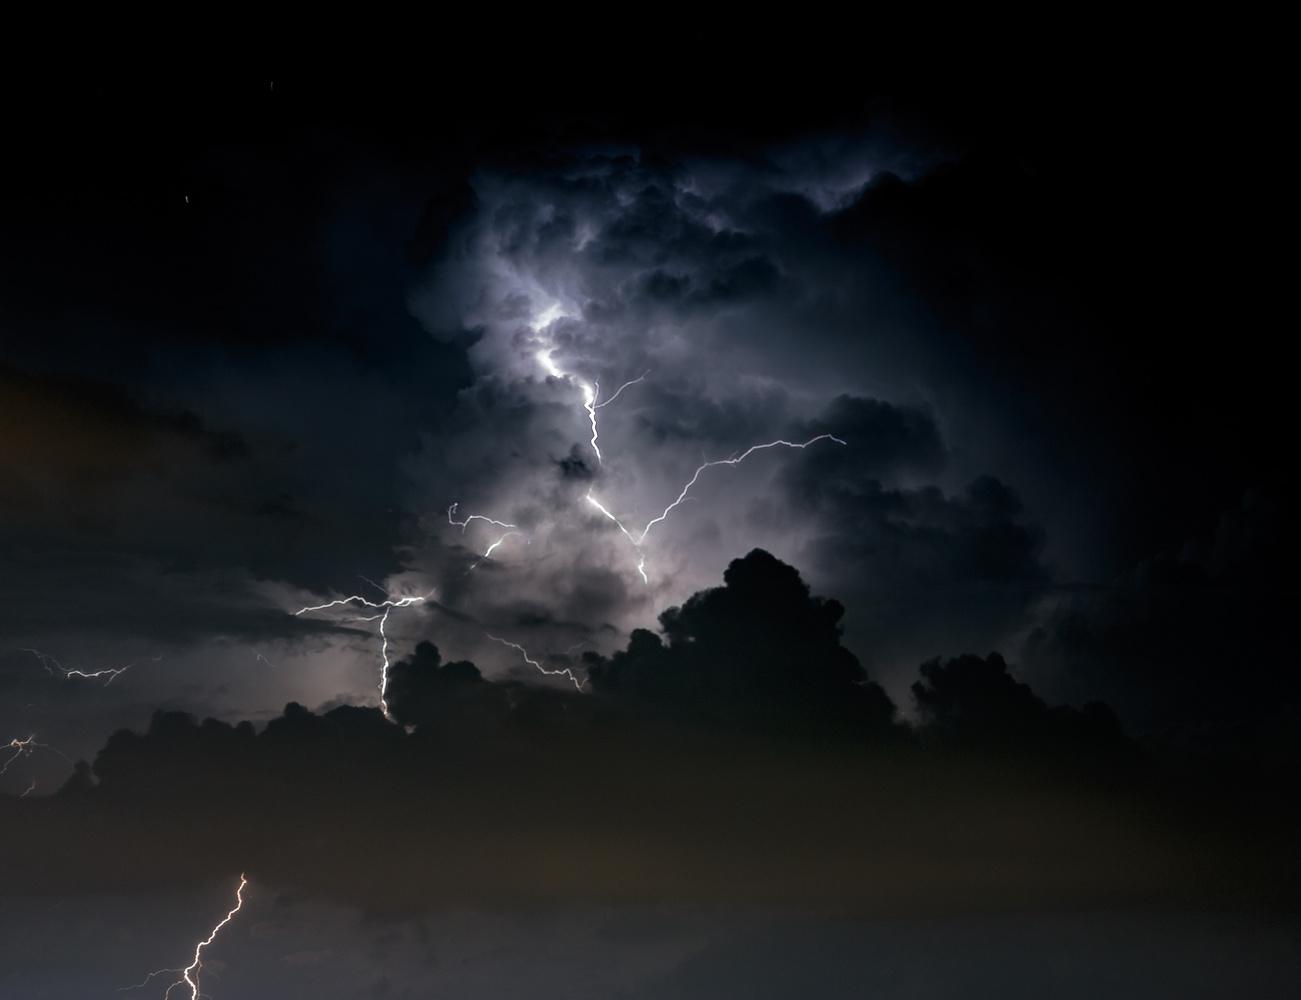 Dark Clouds Gather by Dominique Feliziani